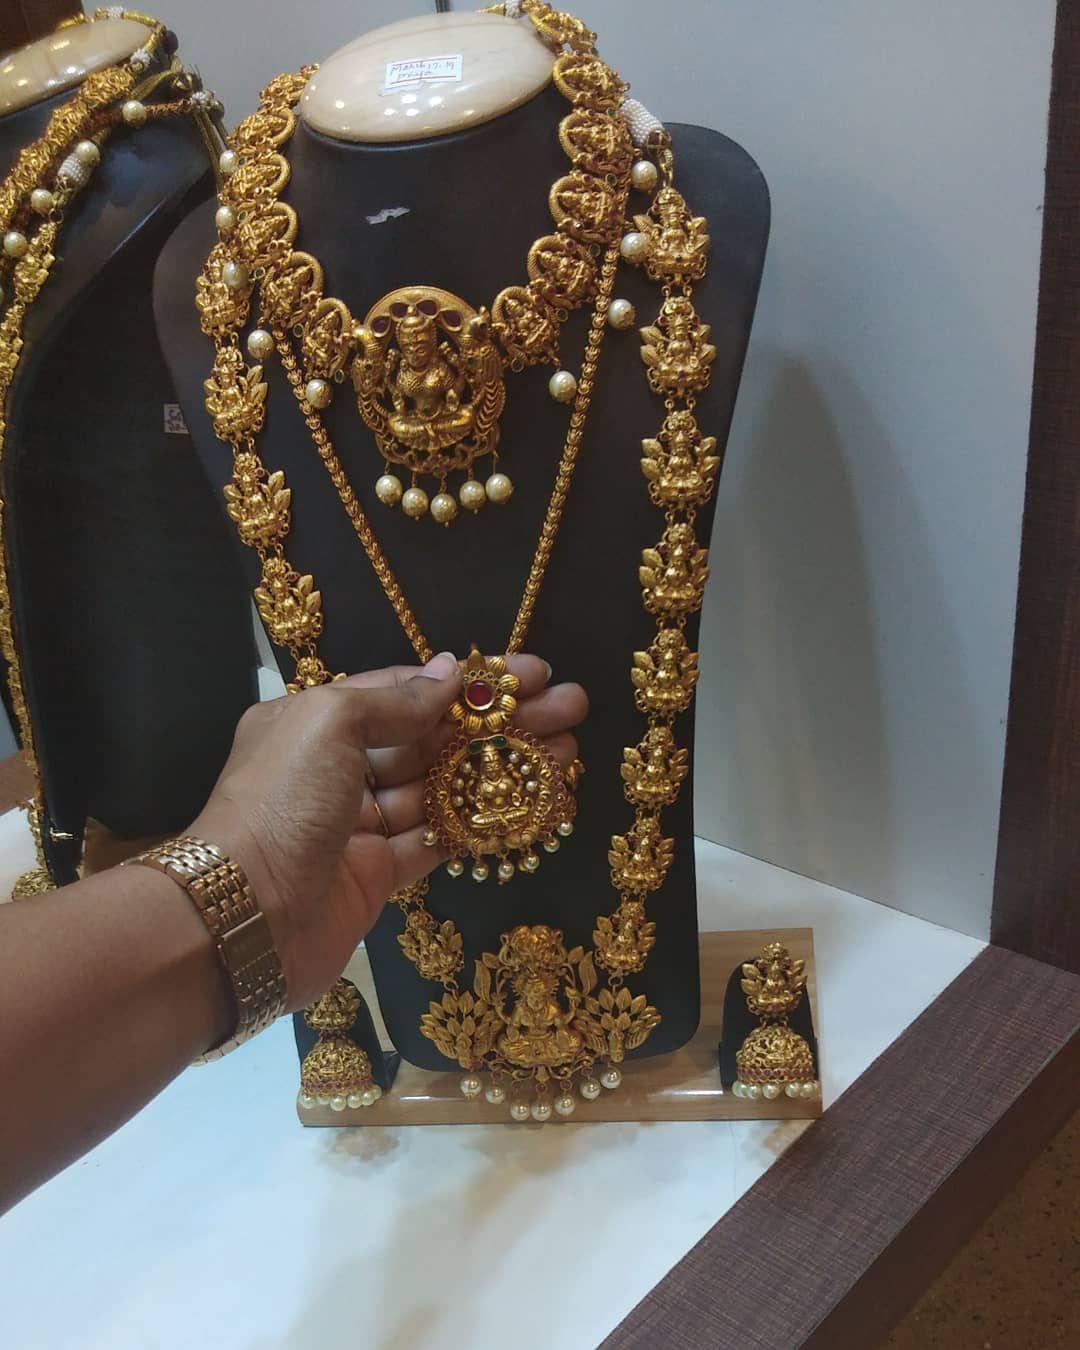 Bridal Rental Jewellery Shopping In Coimbatore Shopping Haul Coimbatore Priya Wedding Col In 2020 Bridal Jewelry Collection Jewelry Shop Bridal Shop